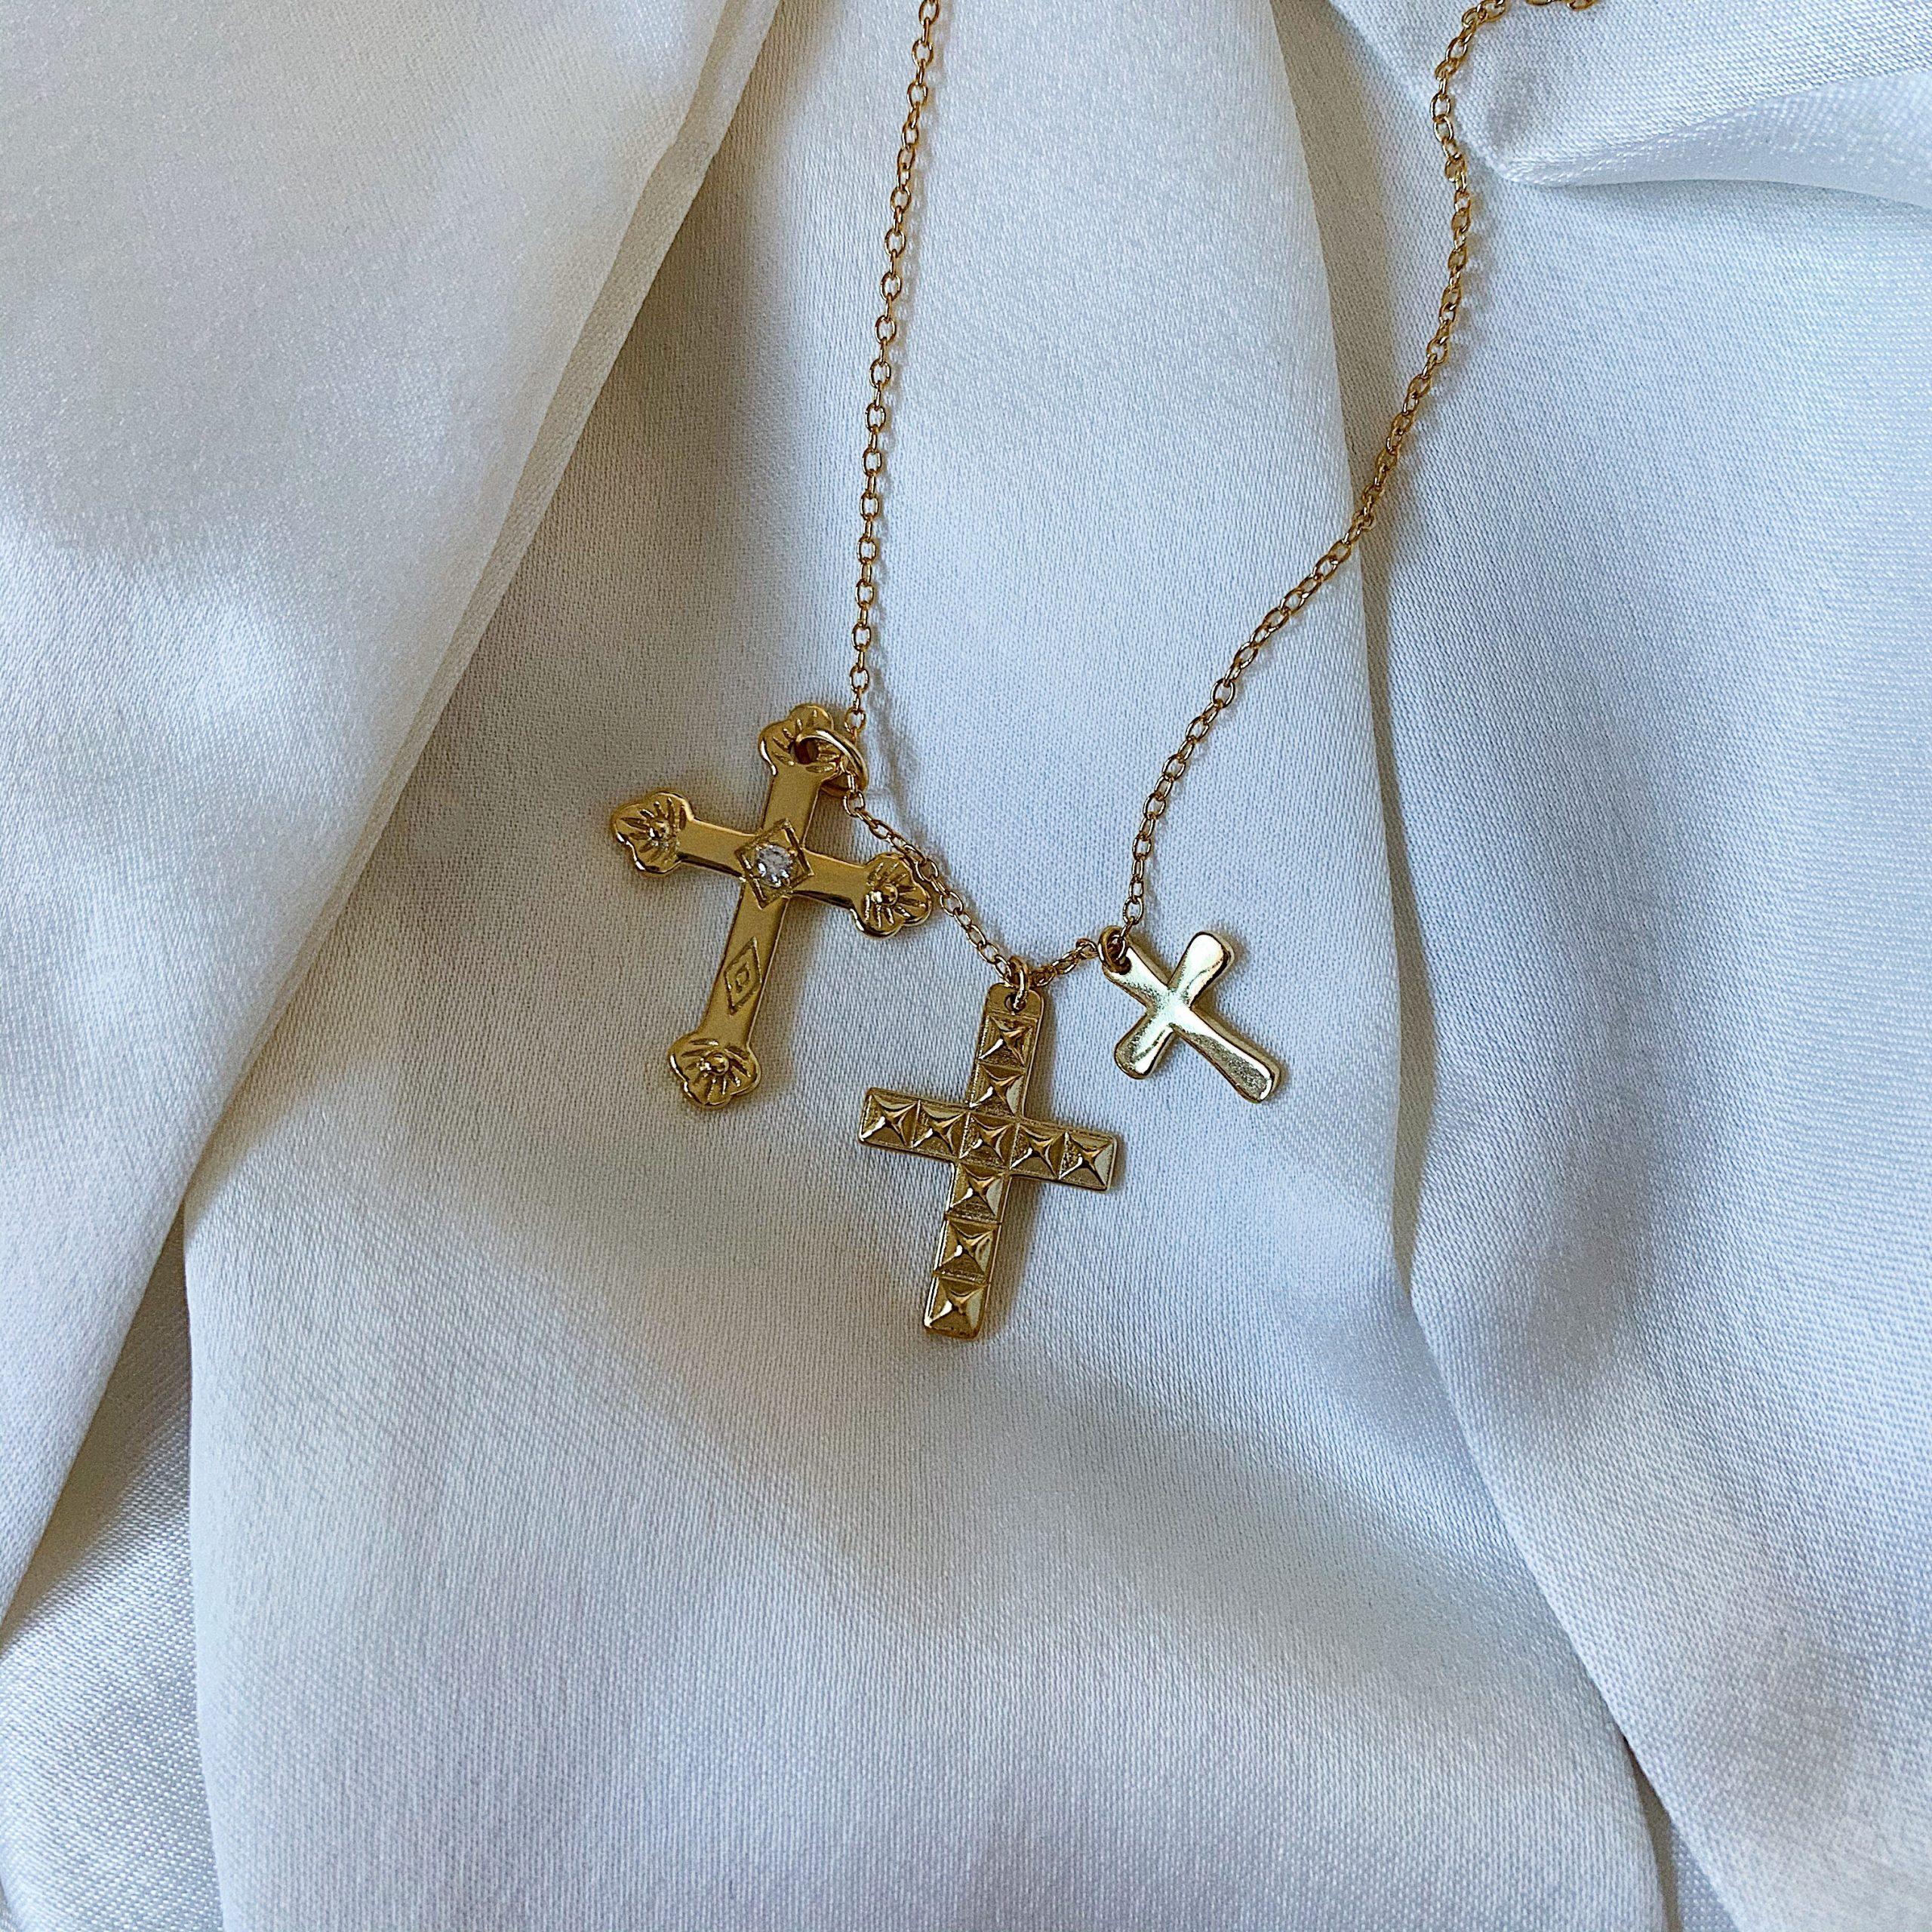 joyería paezma barcelona colgante tres cruces